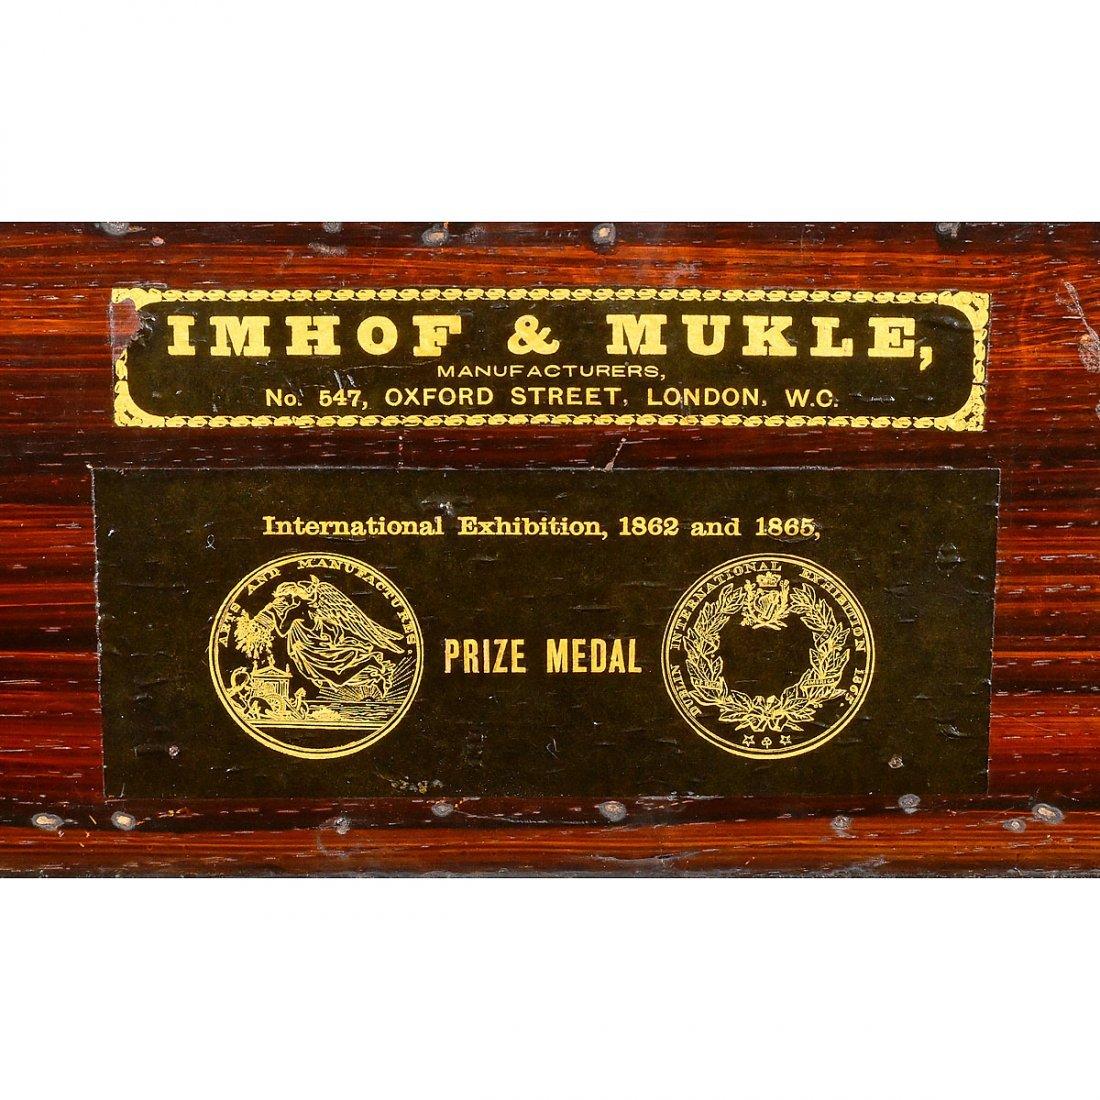 Barrel Organ by Imhof & Mukle, c. 1870 - 4